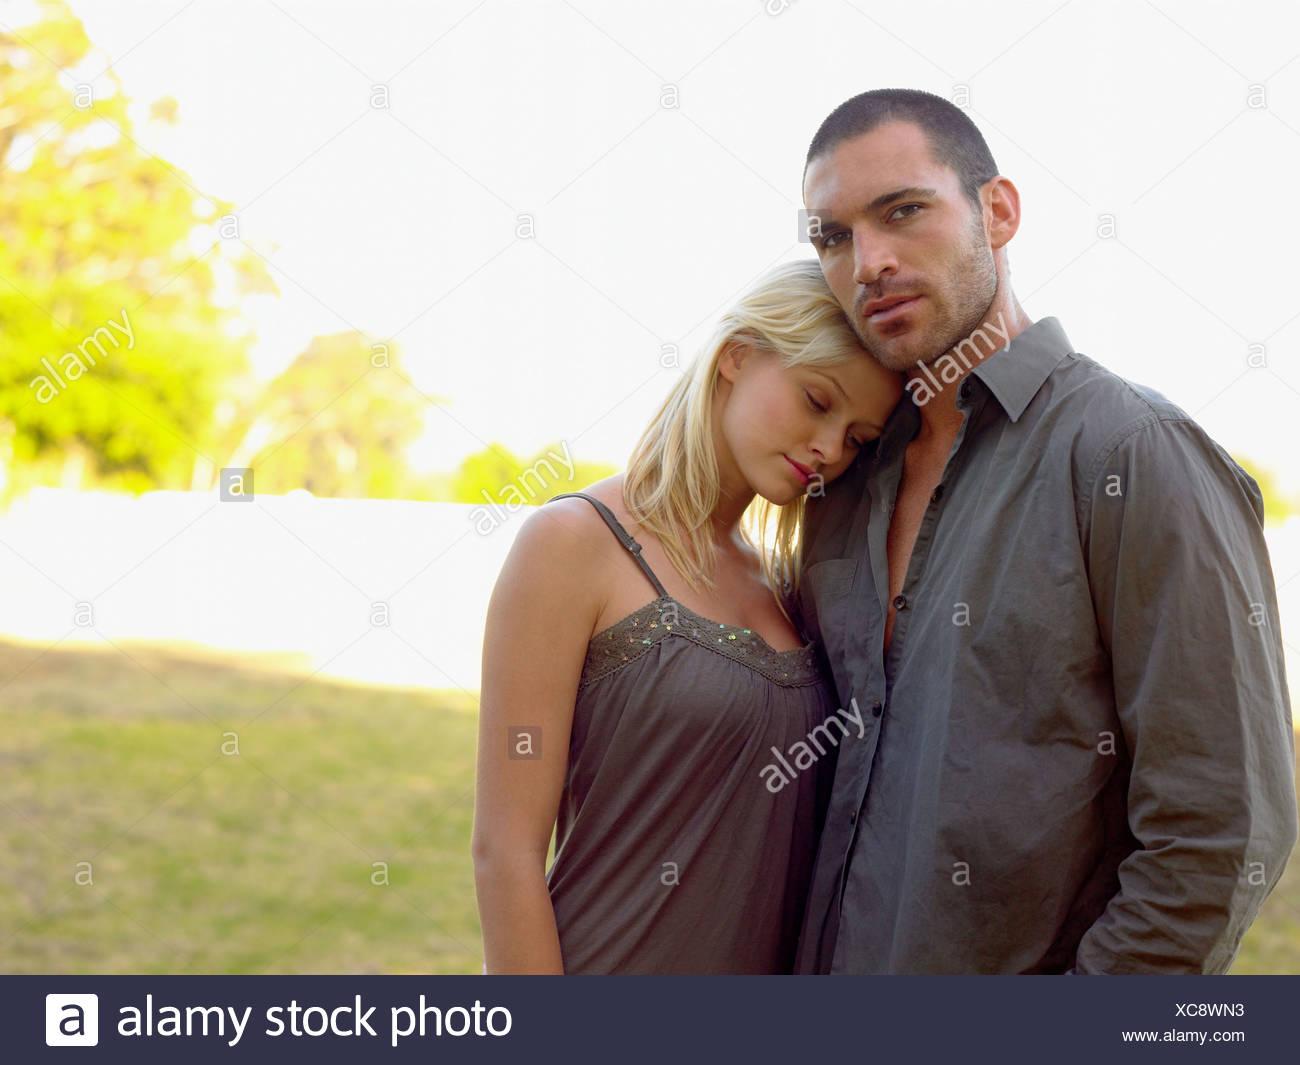 Couple stood outdoors - Stock Image